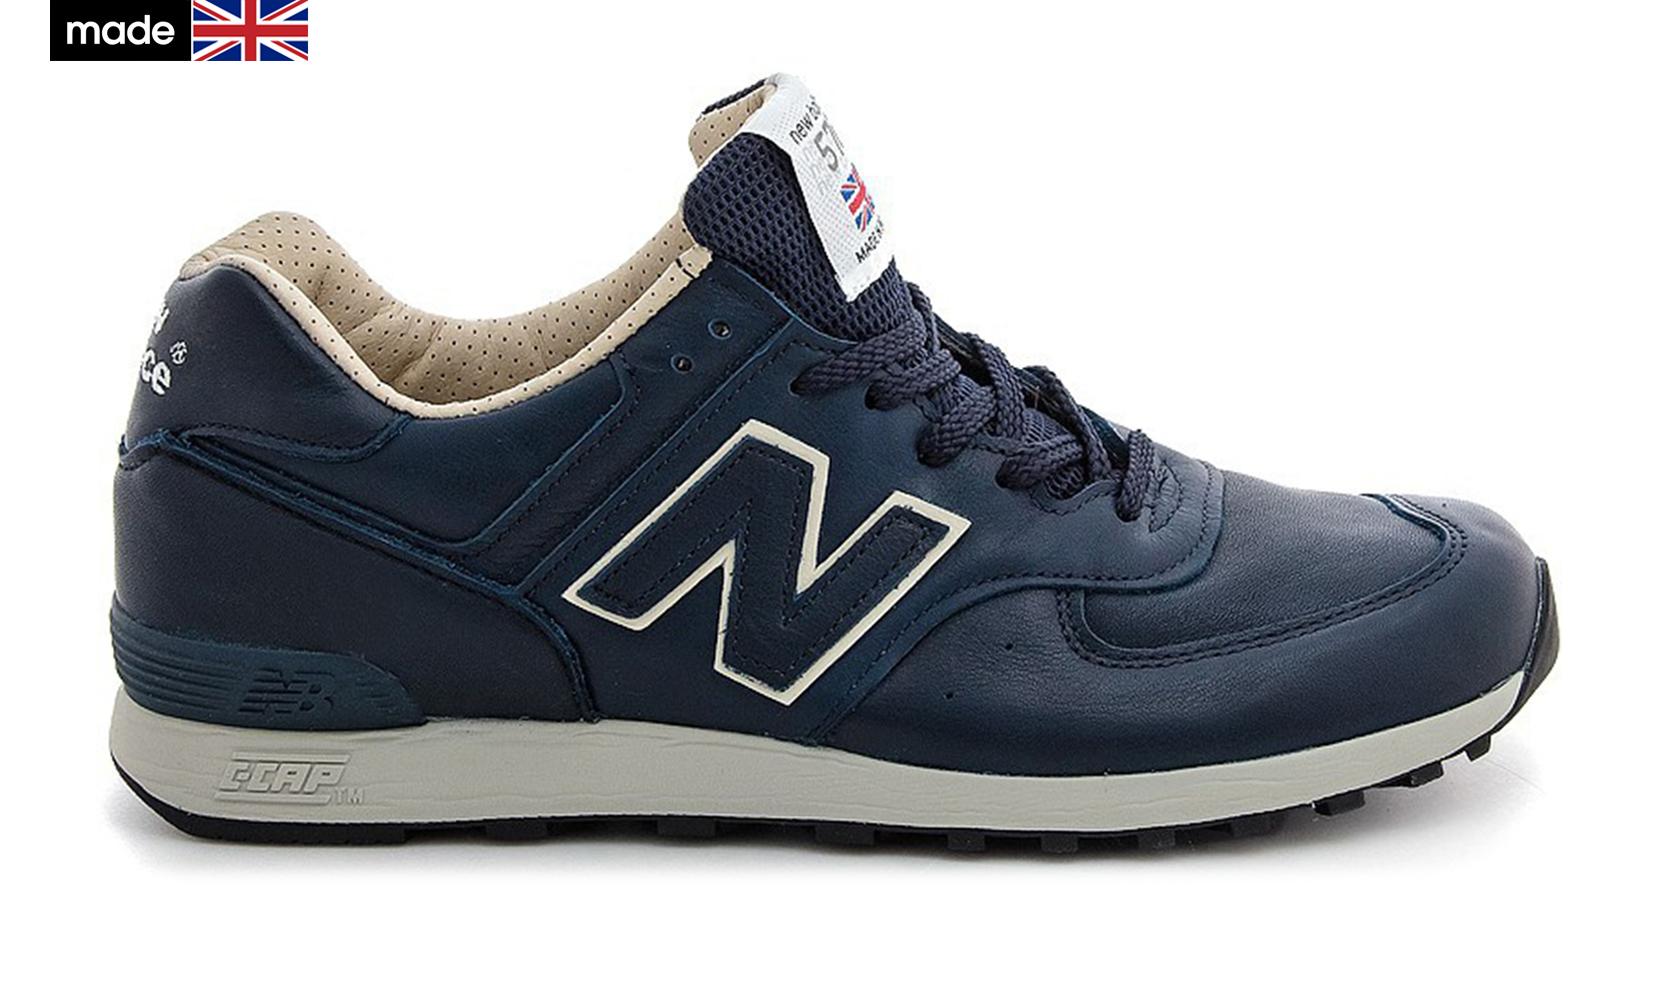 Чоловіче взуття повсякденне New Balance 576 Made in UK M576CNN | New Balance